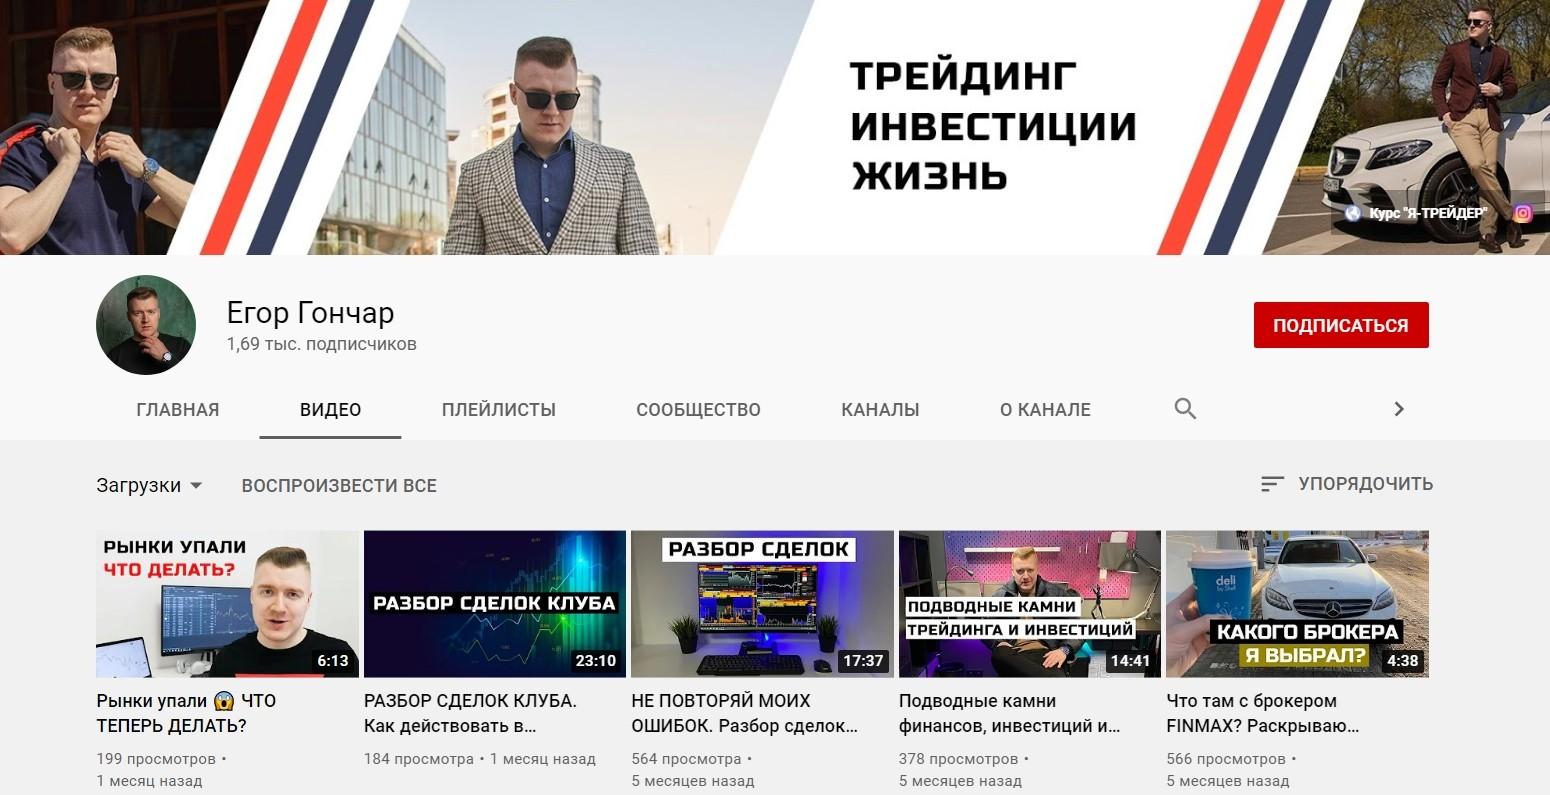 Ютуб канал Евгения Гончара